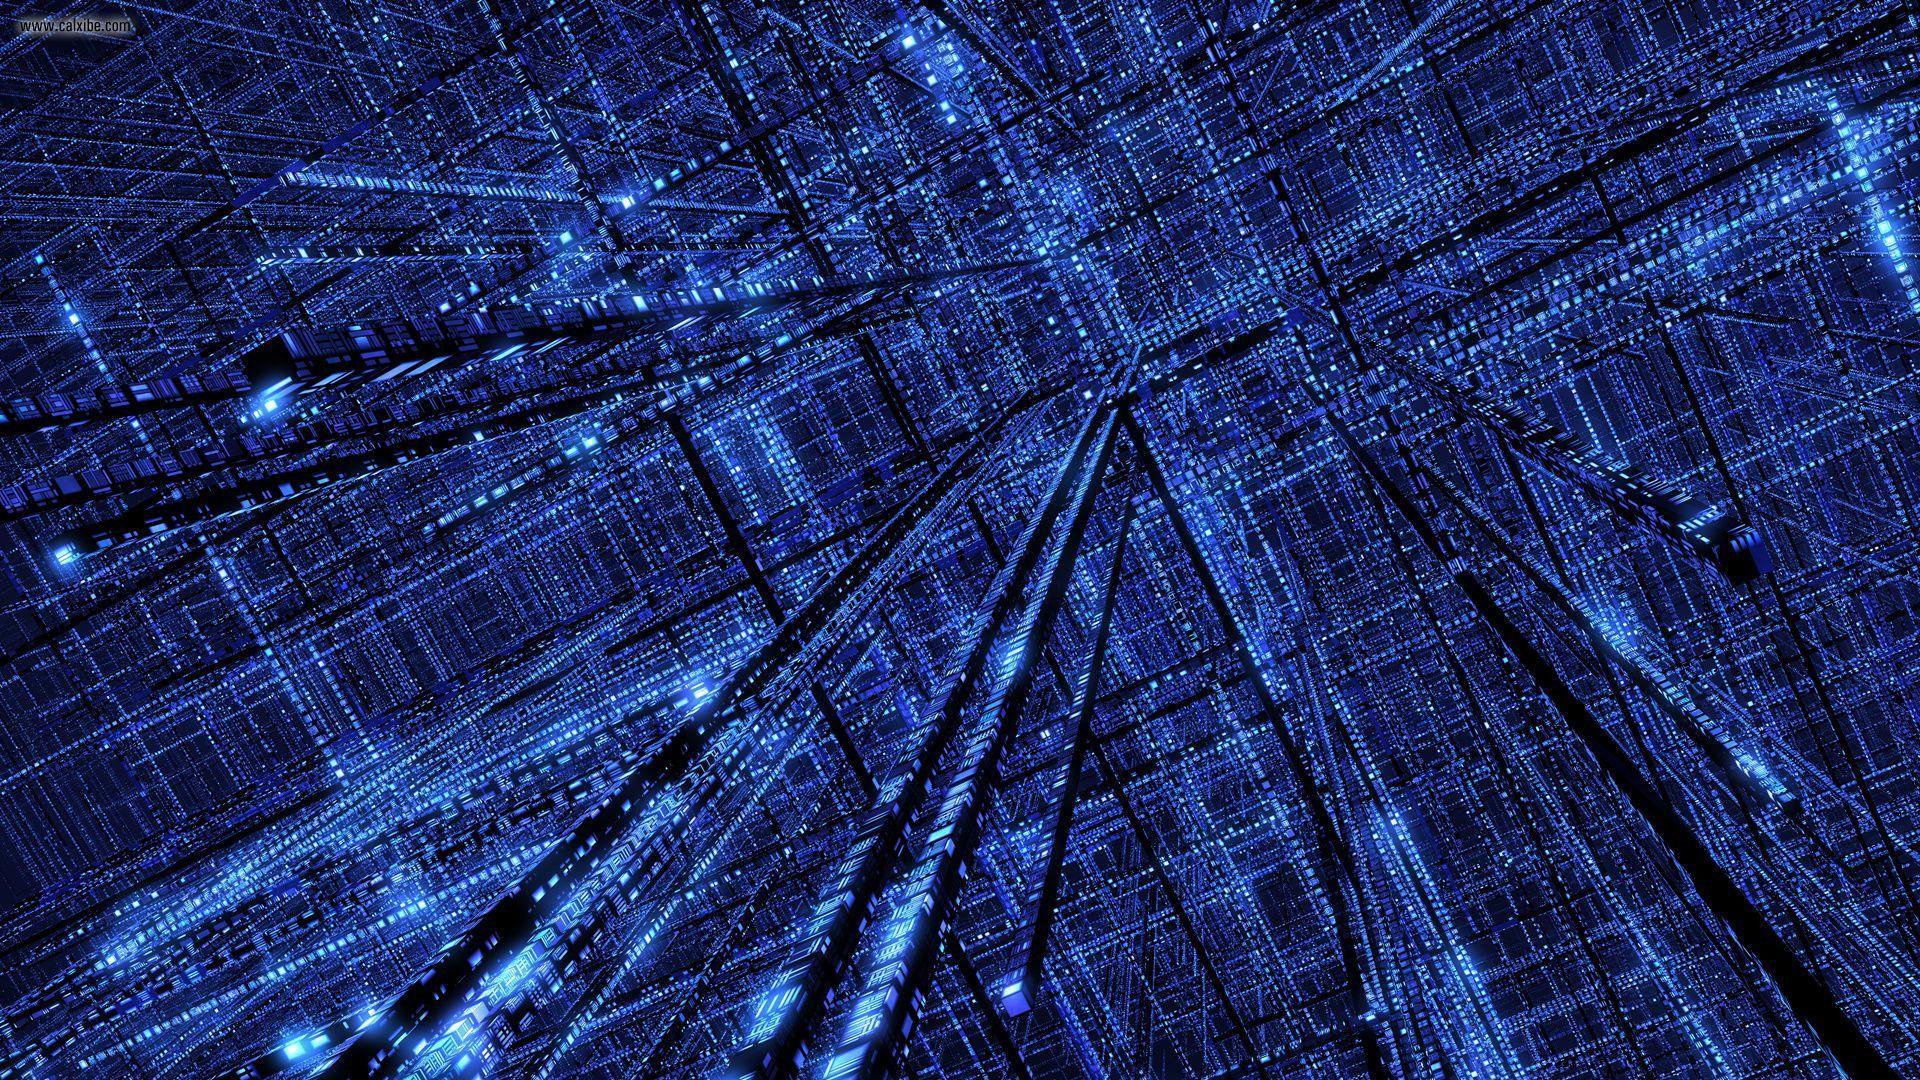 1920x1080 wallpaper wiki hd animated matrix wallpaper 1 pic